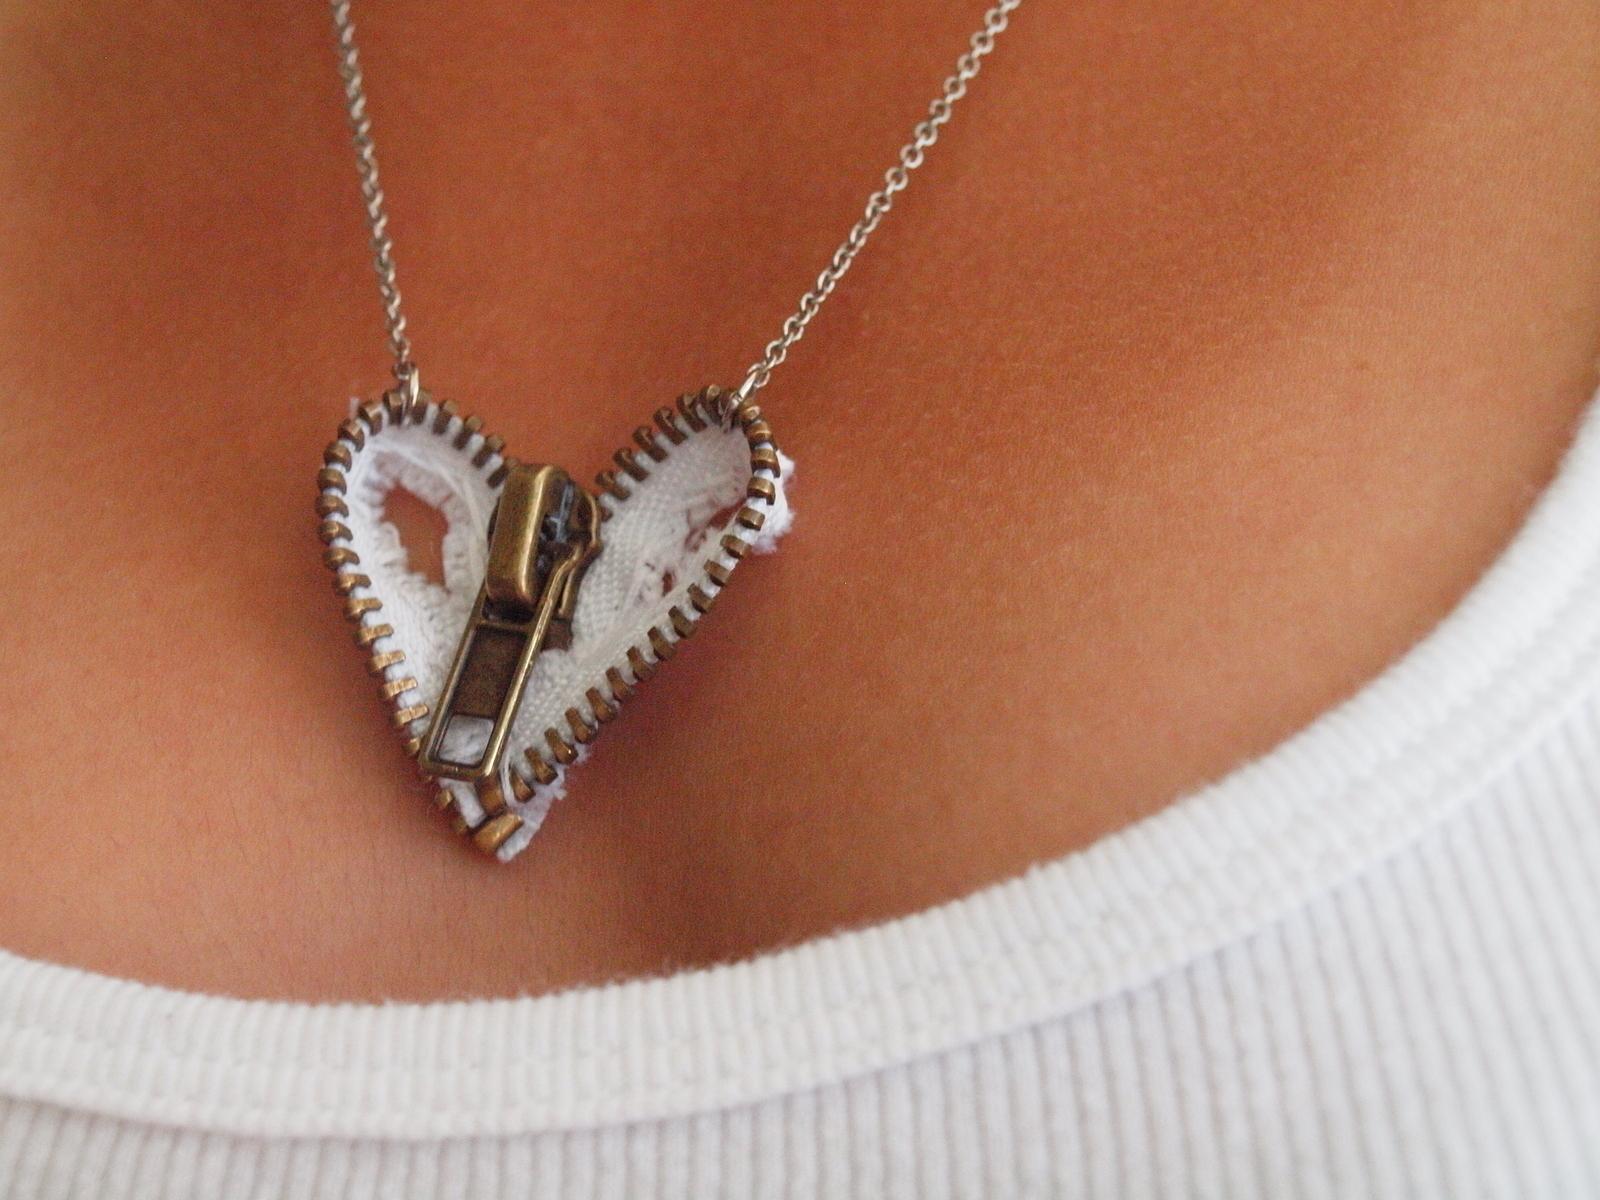 Zipper Heart Necklace 183 How To Make A Zipper Necklace